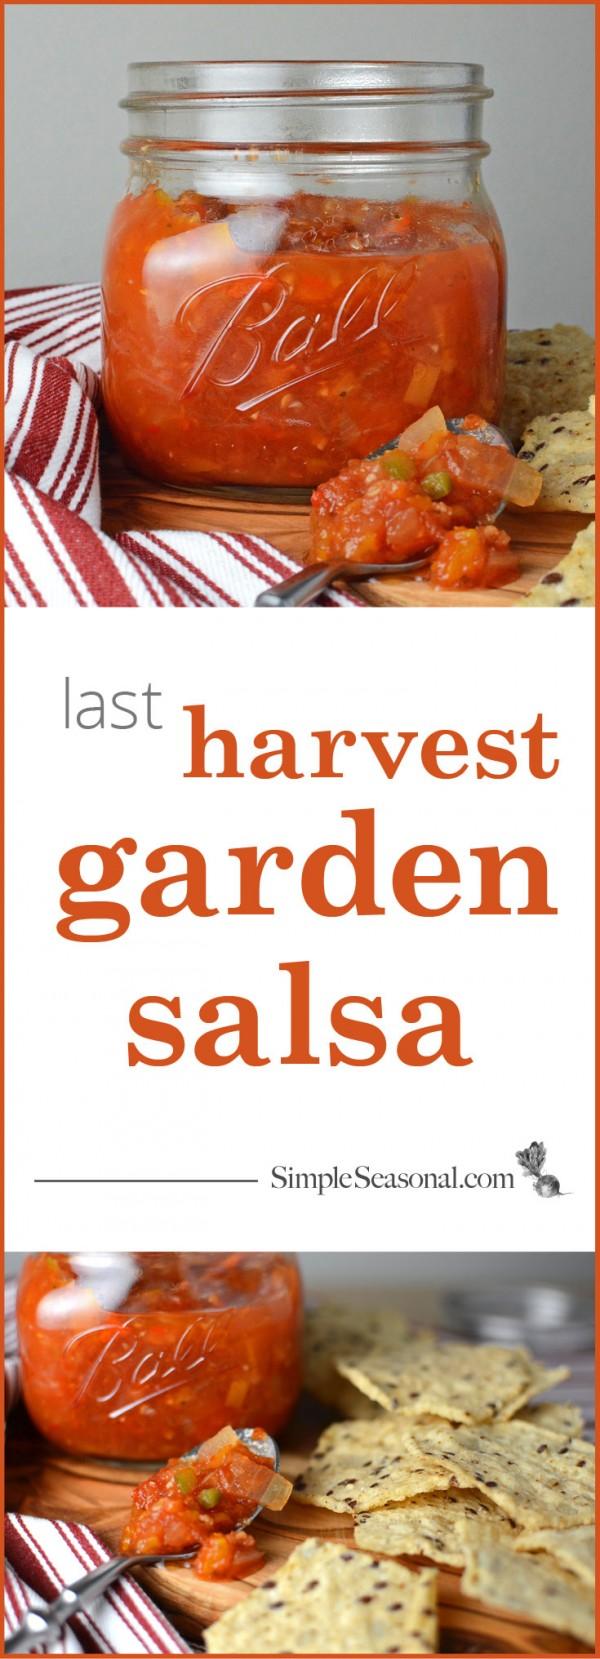 last harvest garden salsa